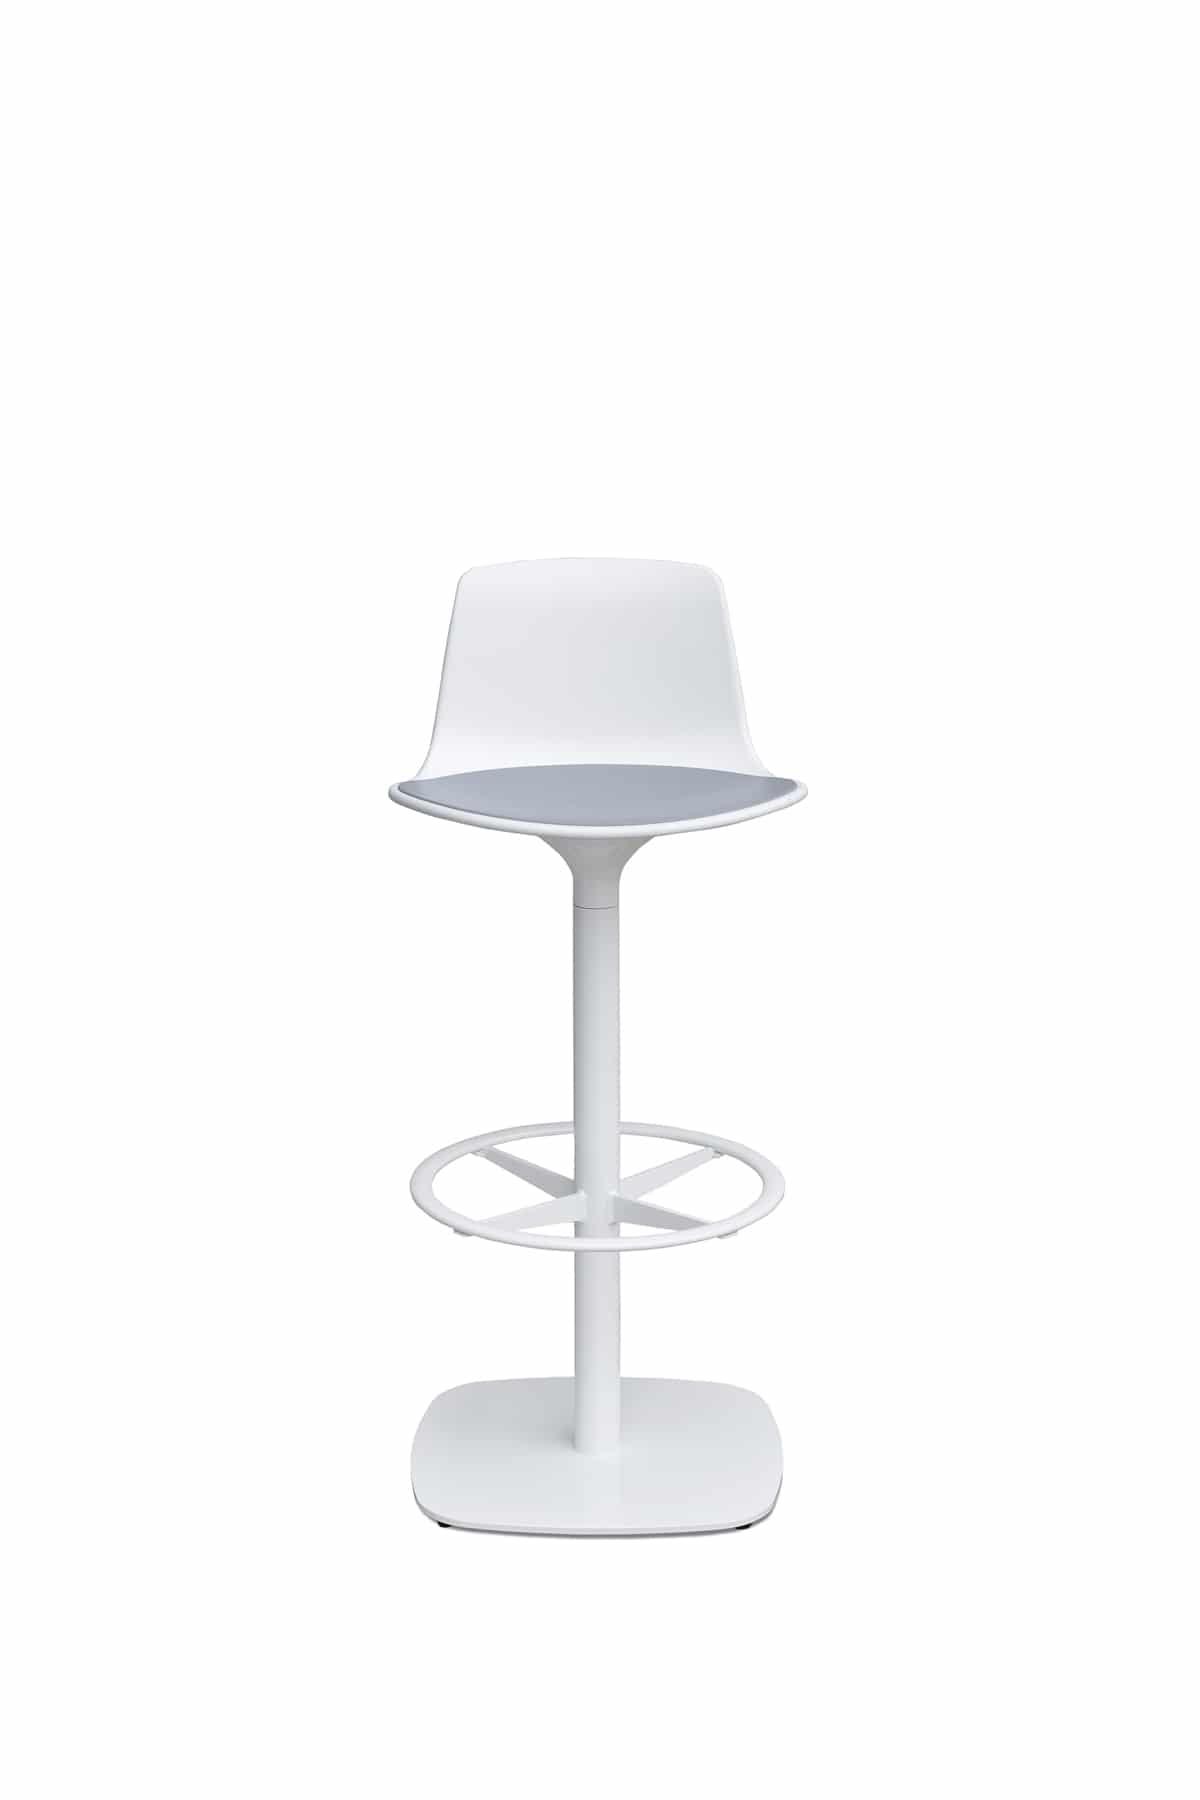 Lottus stool